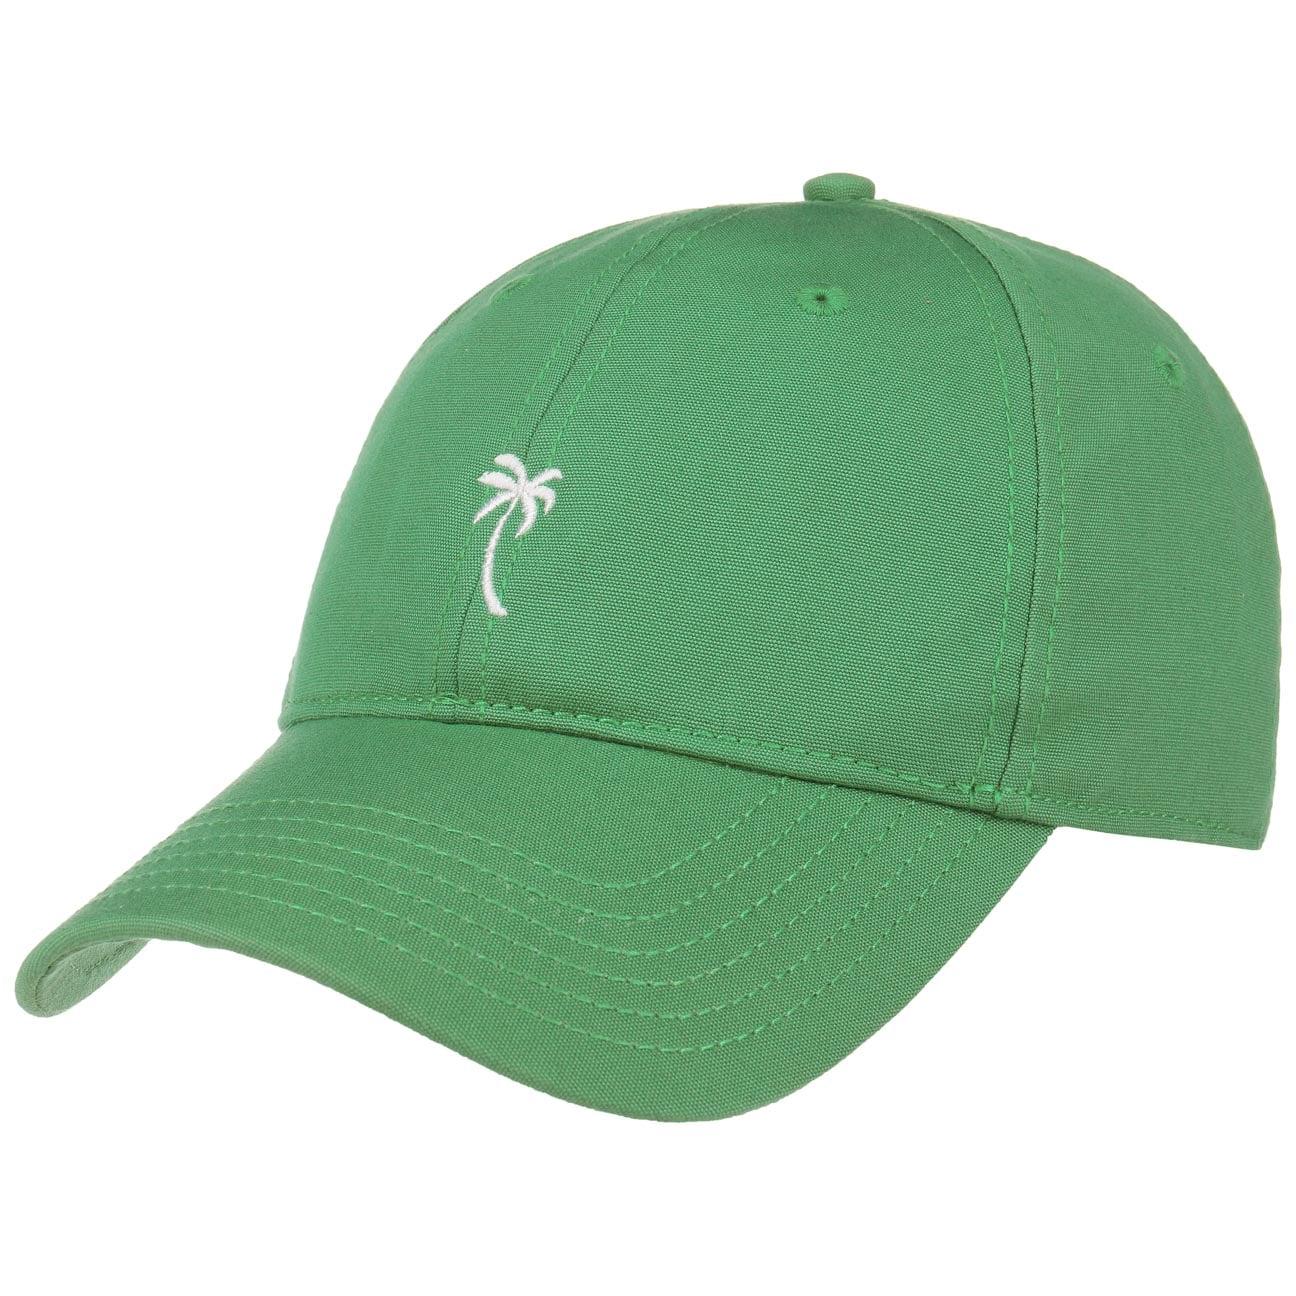 Gorra Palm Strapback by dedicated